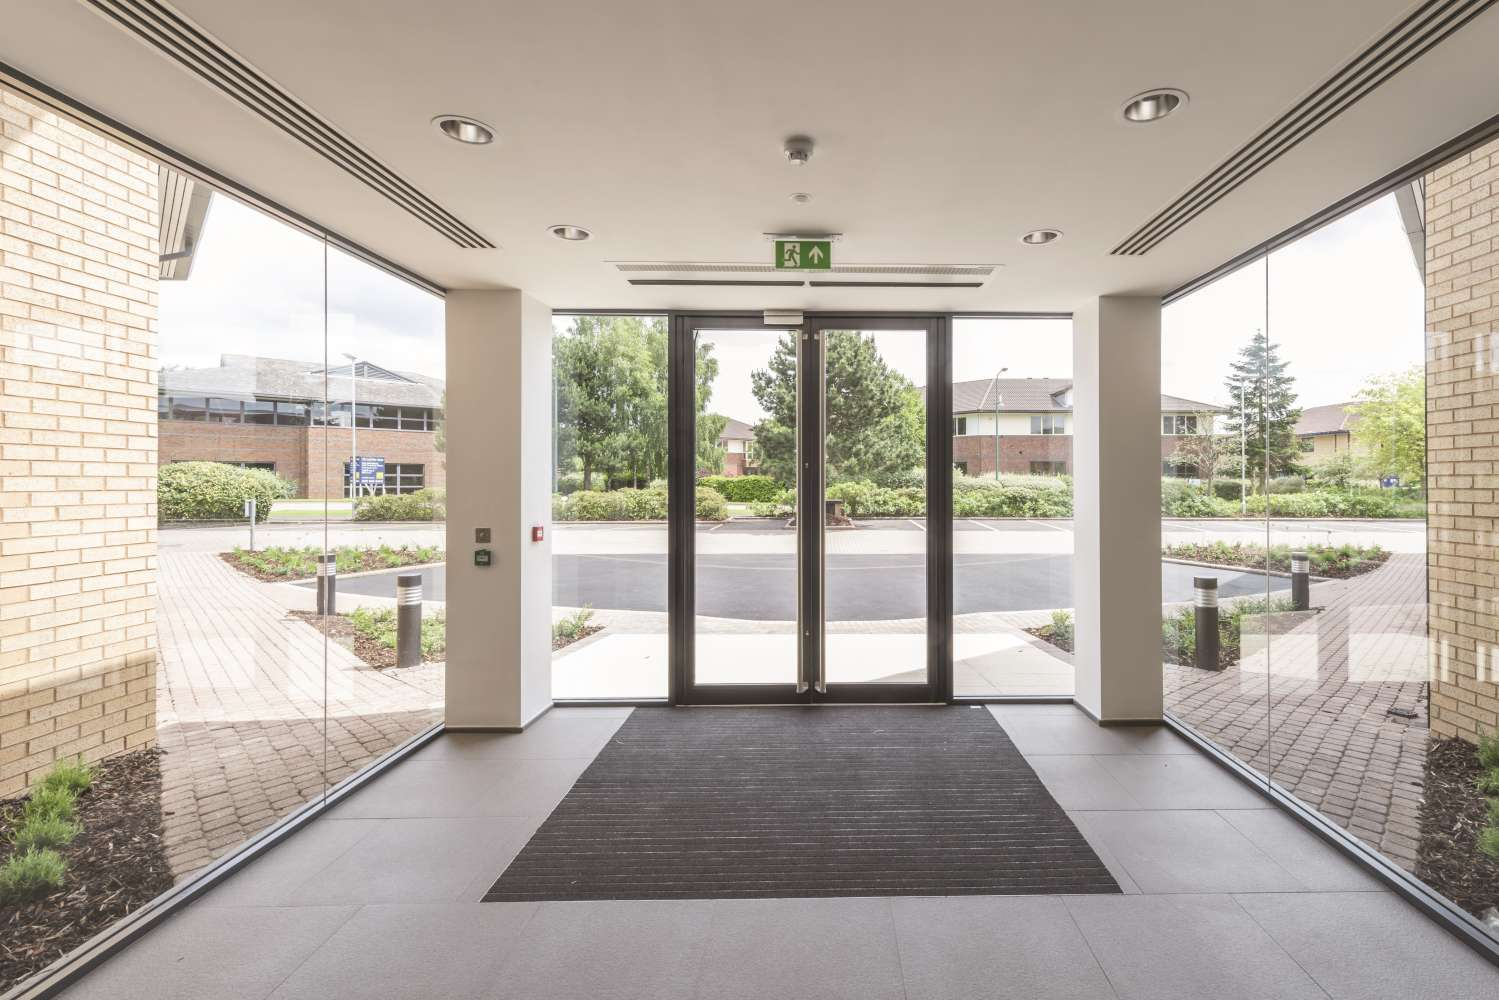 Office Birmingham, B37 7YE - 2100 The Crescent, Birmingham Business Park - 2100